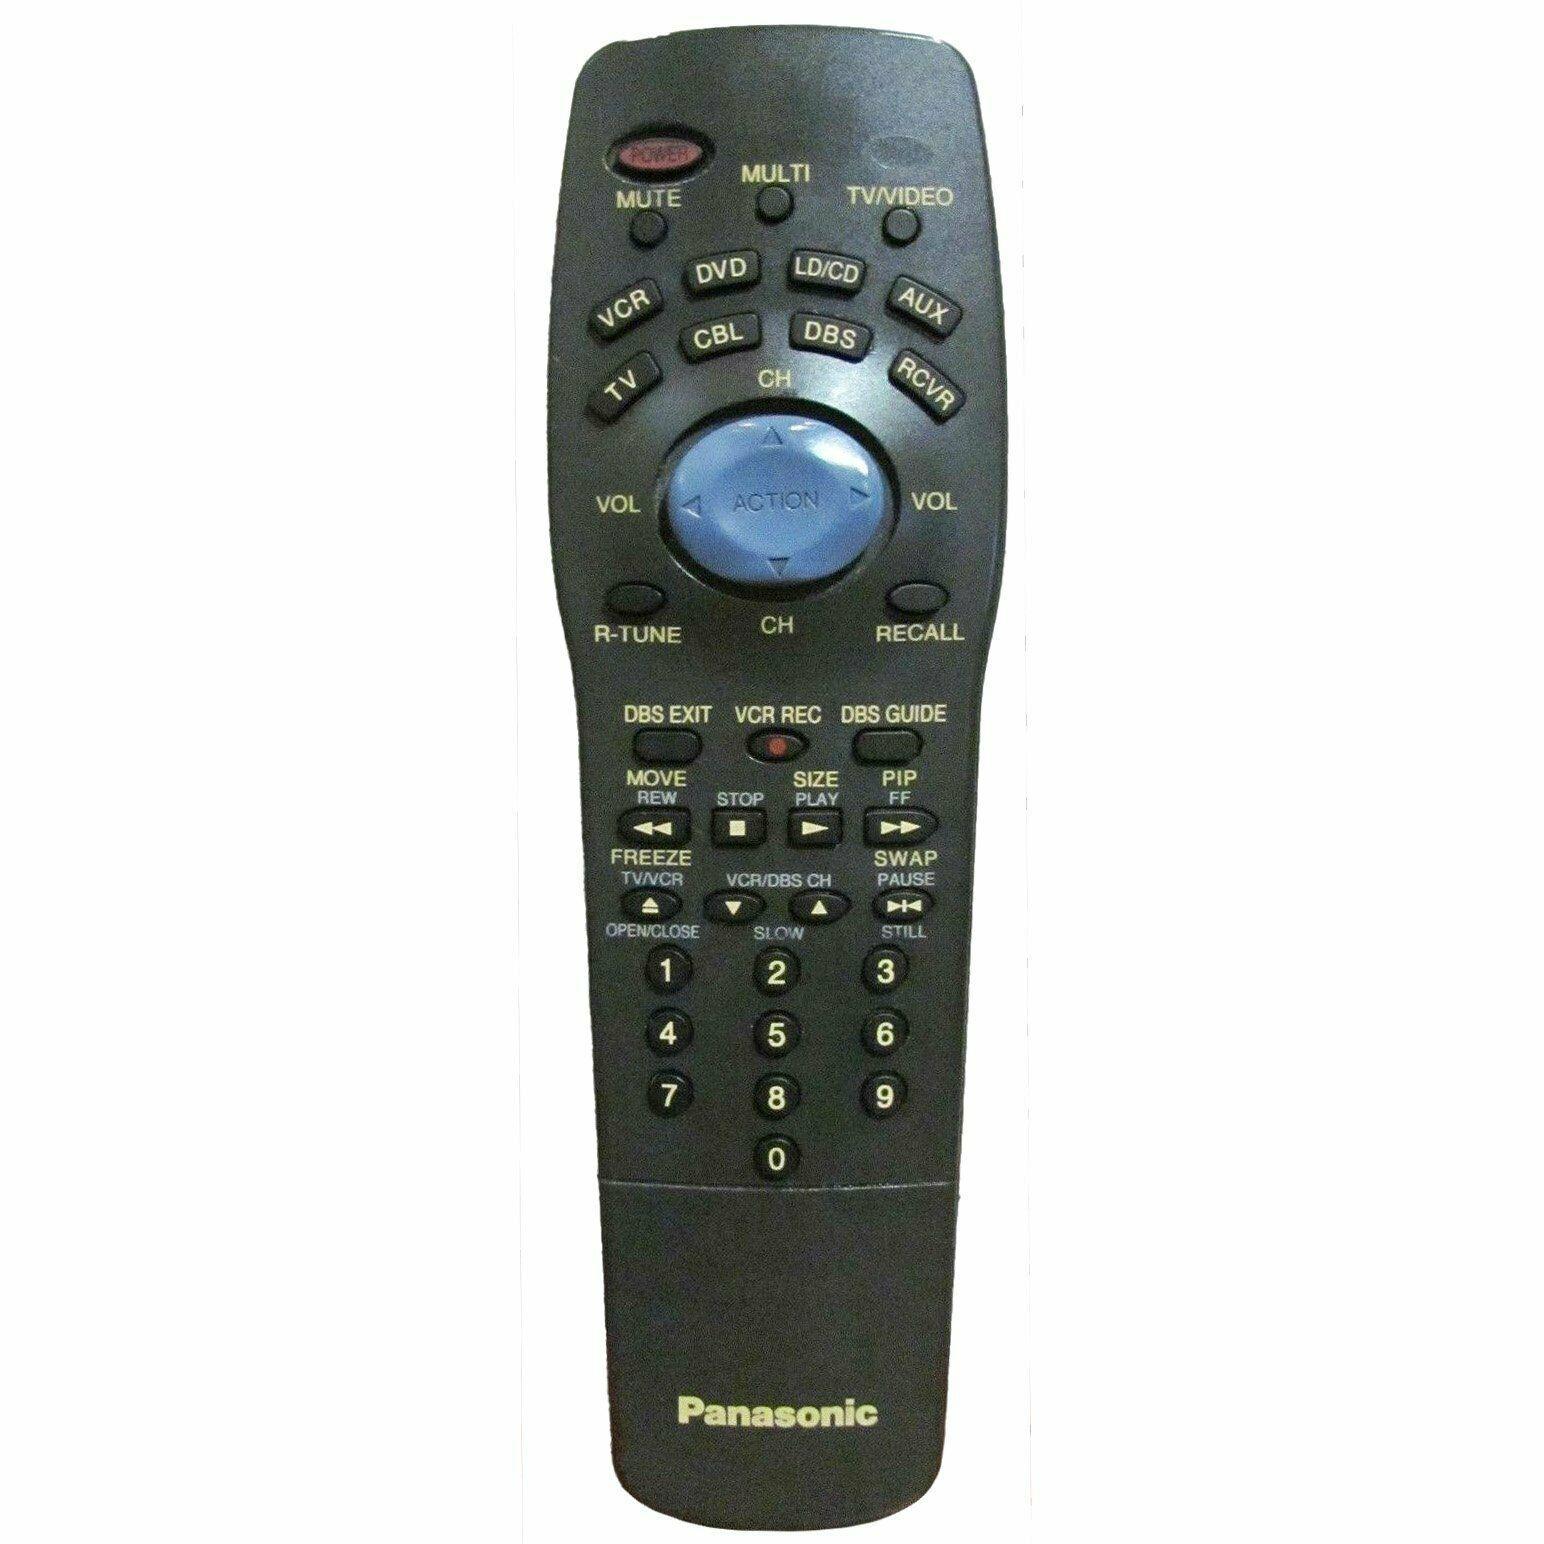 Panasonic EUR511170B Factory Original TV Remote CT27623, CT36923, CT2AG23 - $10.59